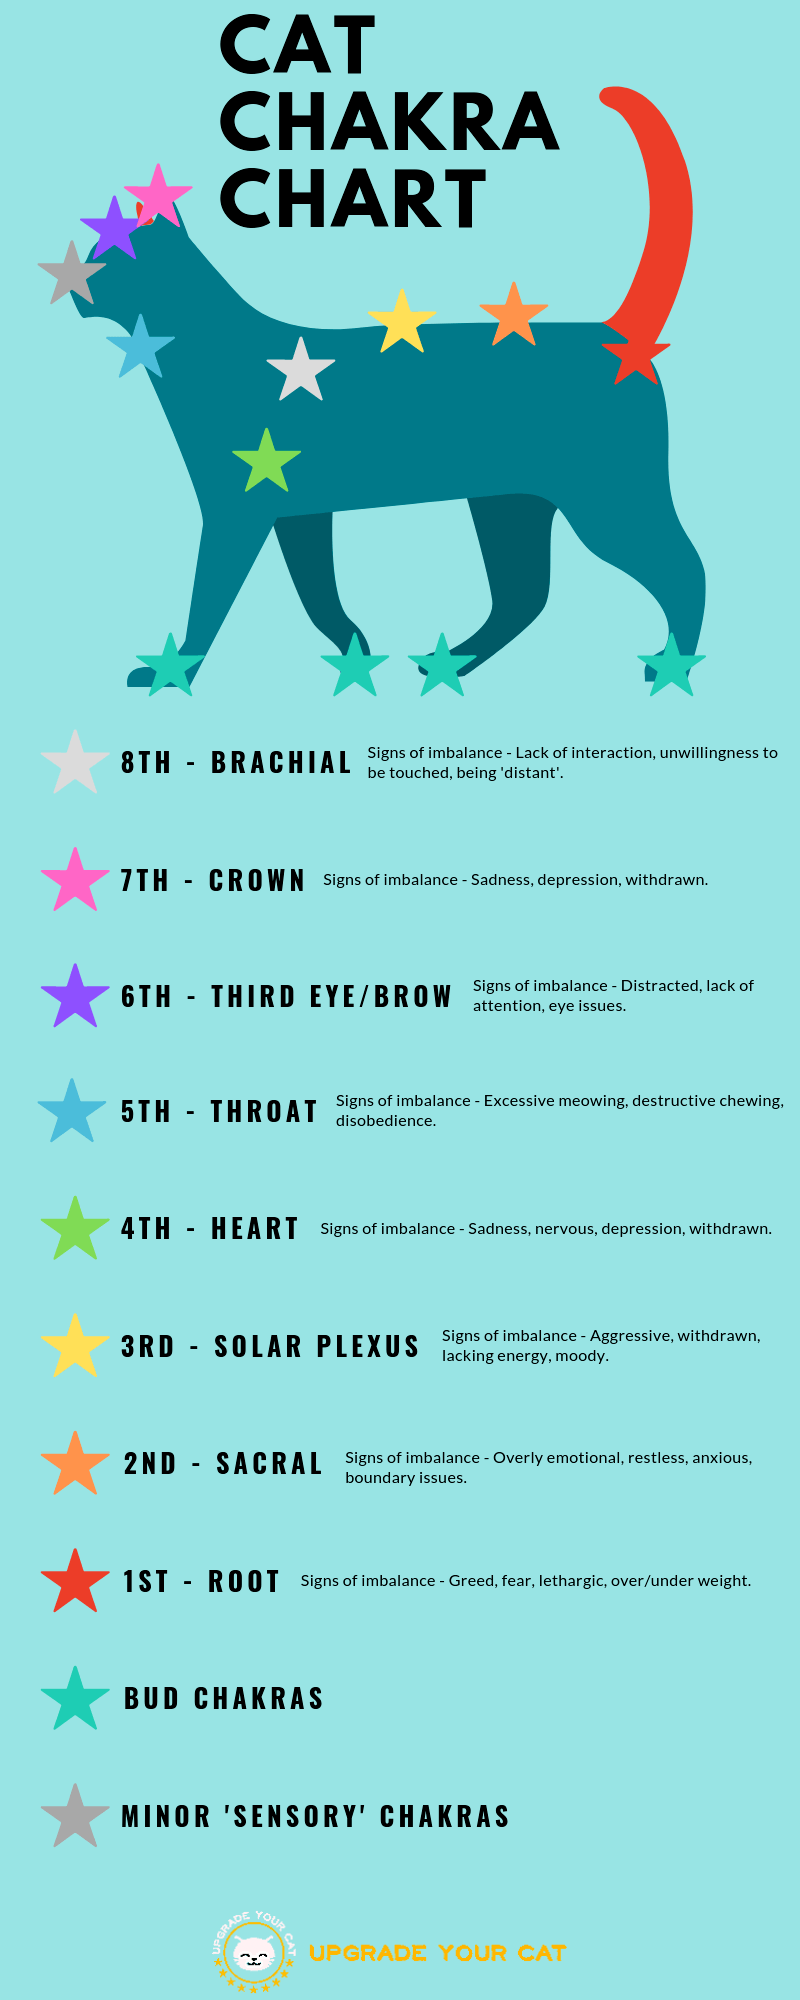 Cat Chakra Chart Infographic